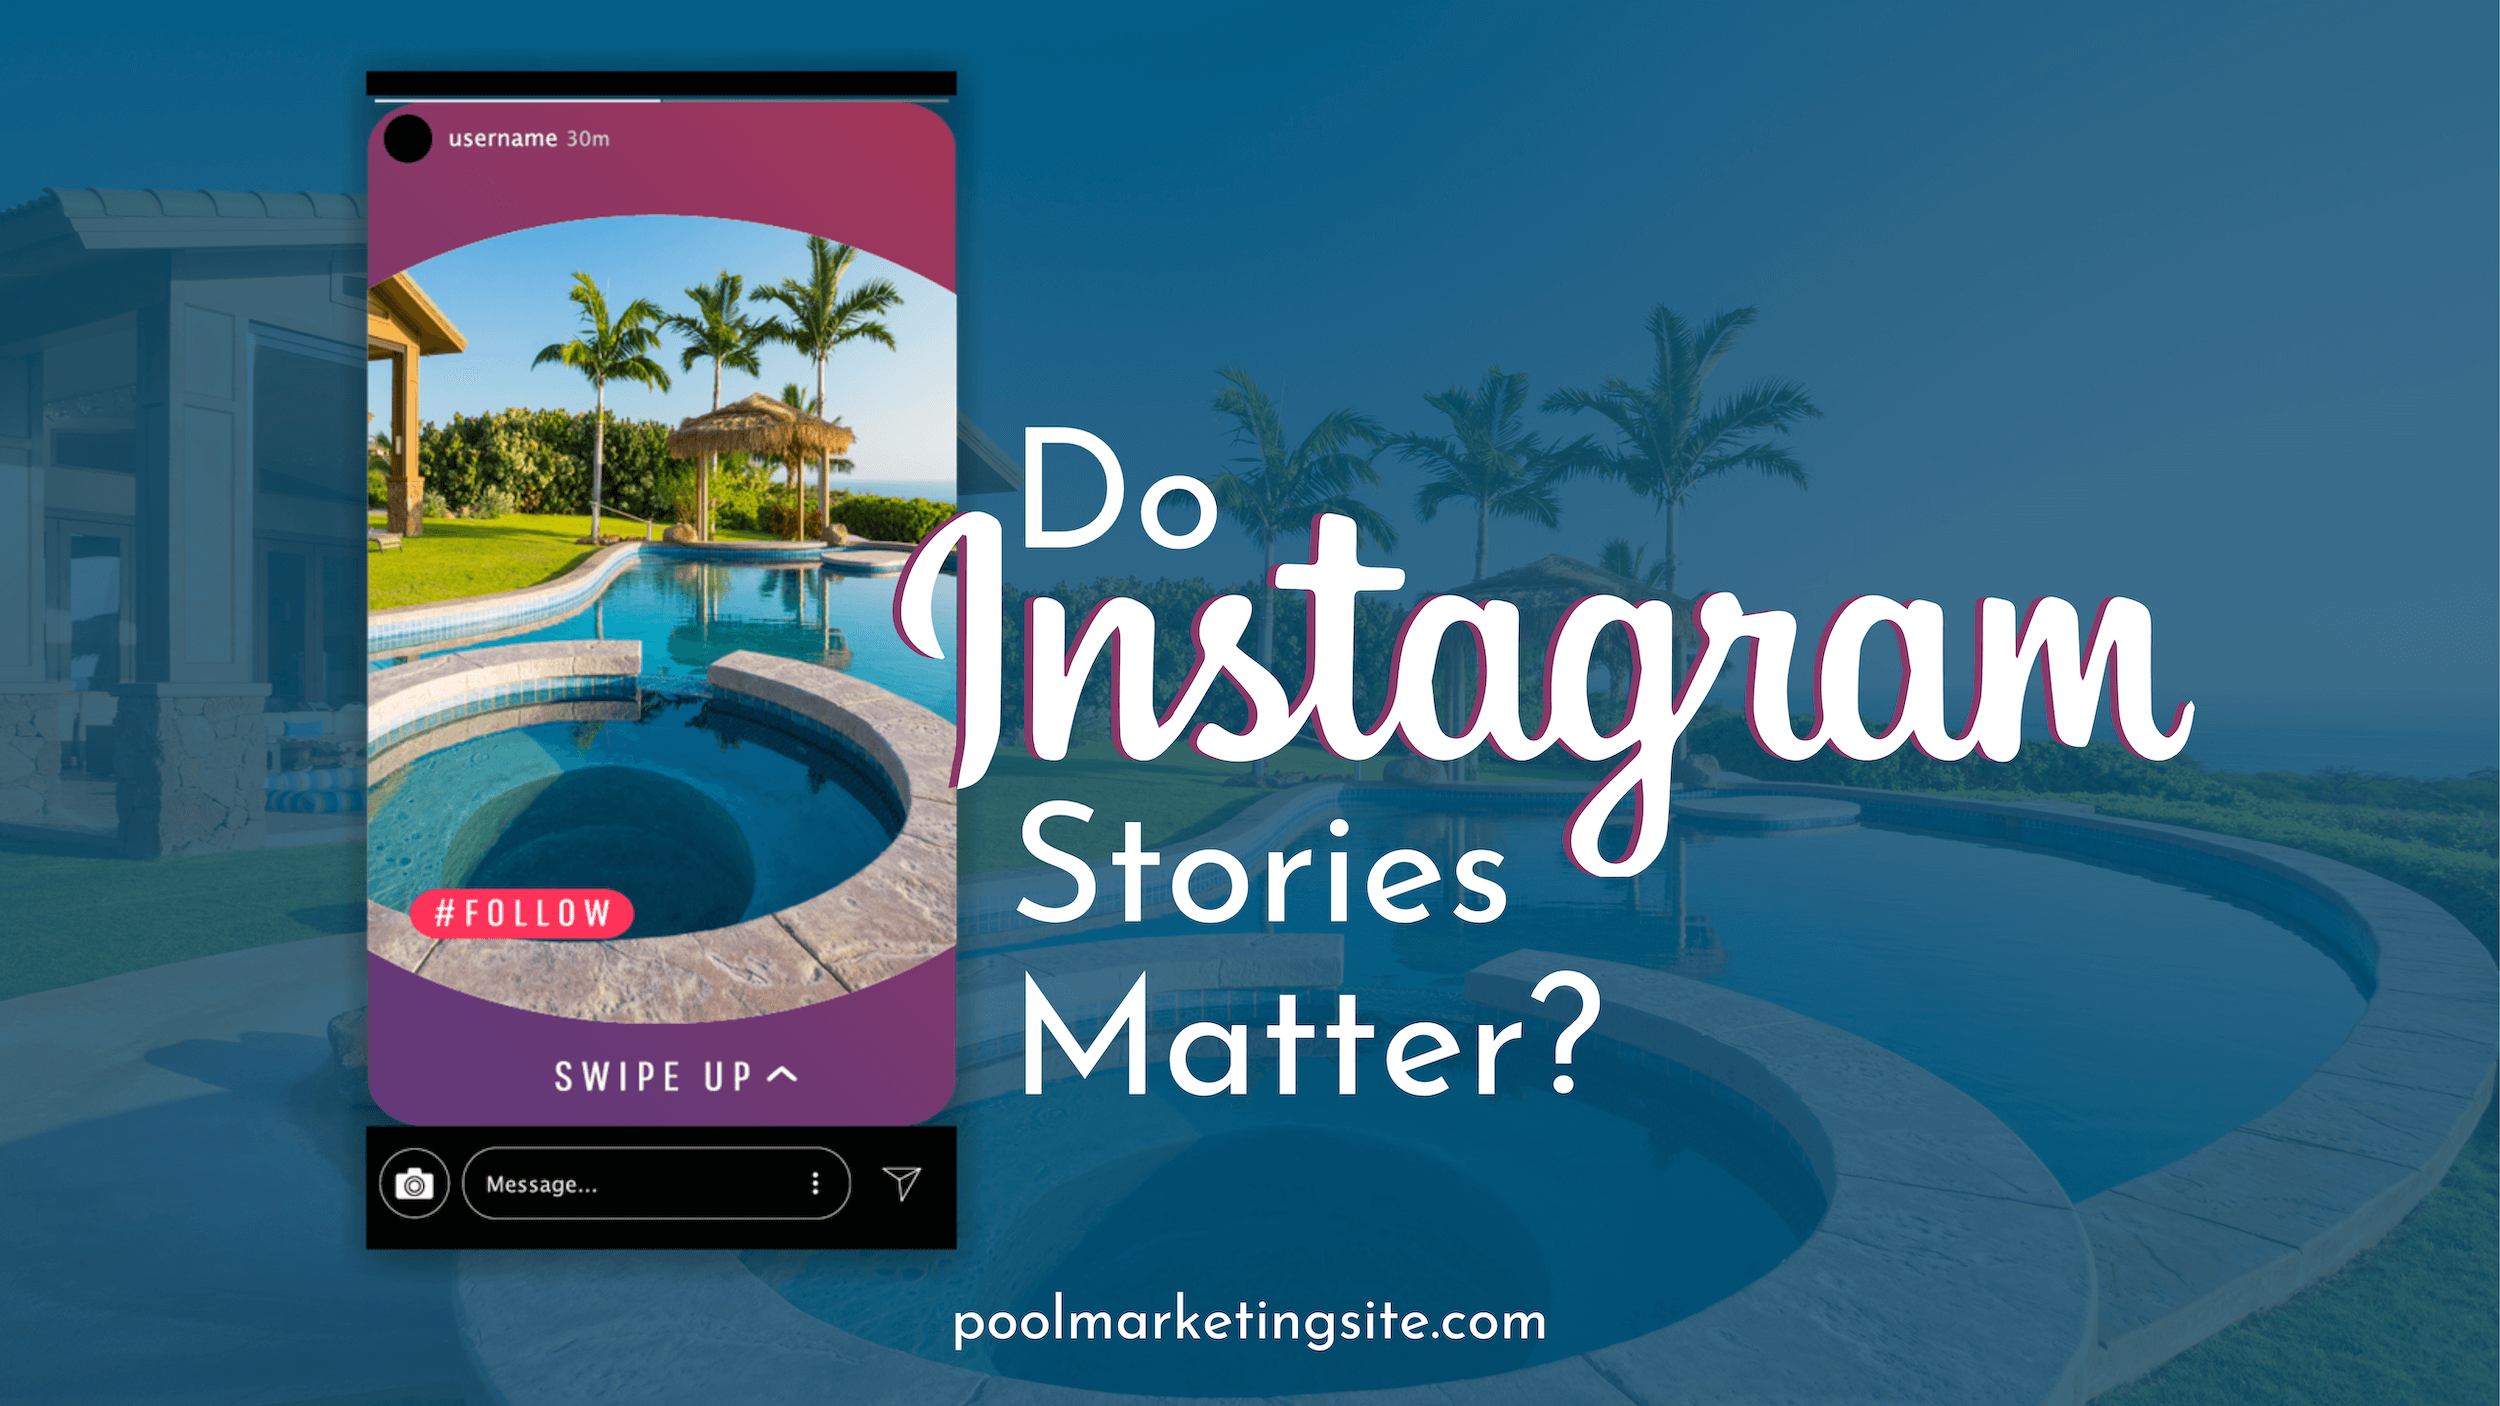 Do Instagram Stories Matter?